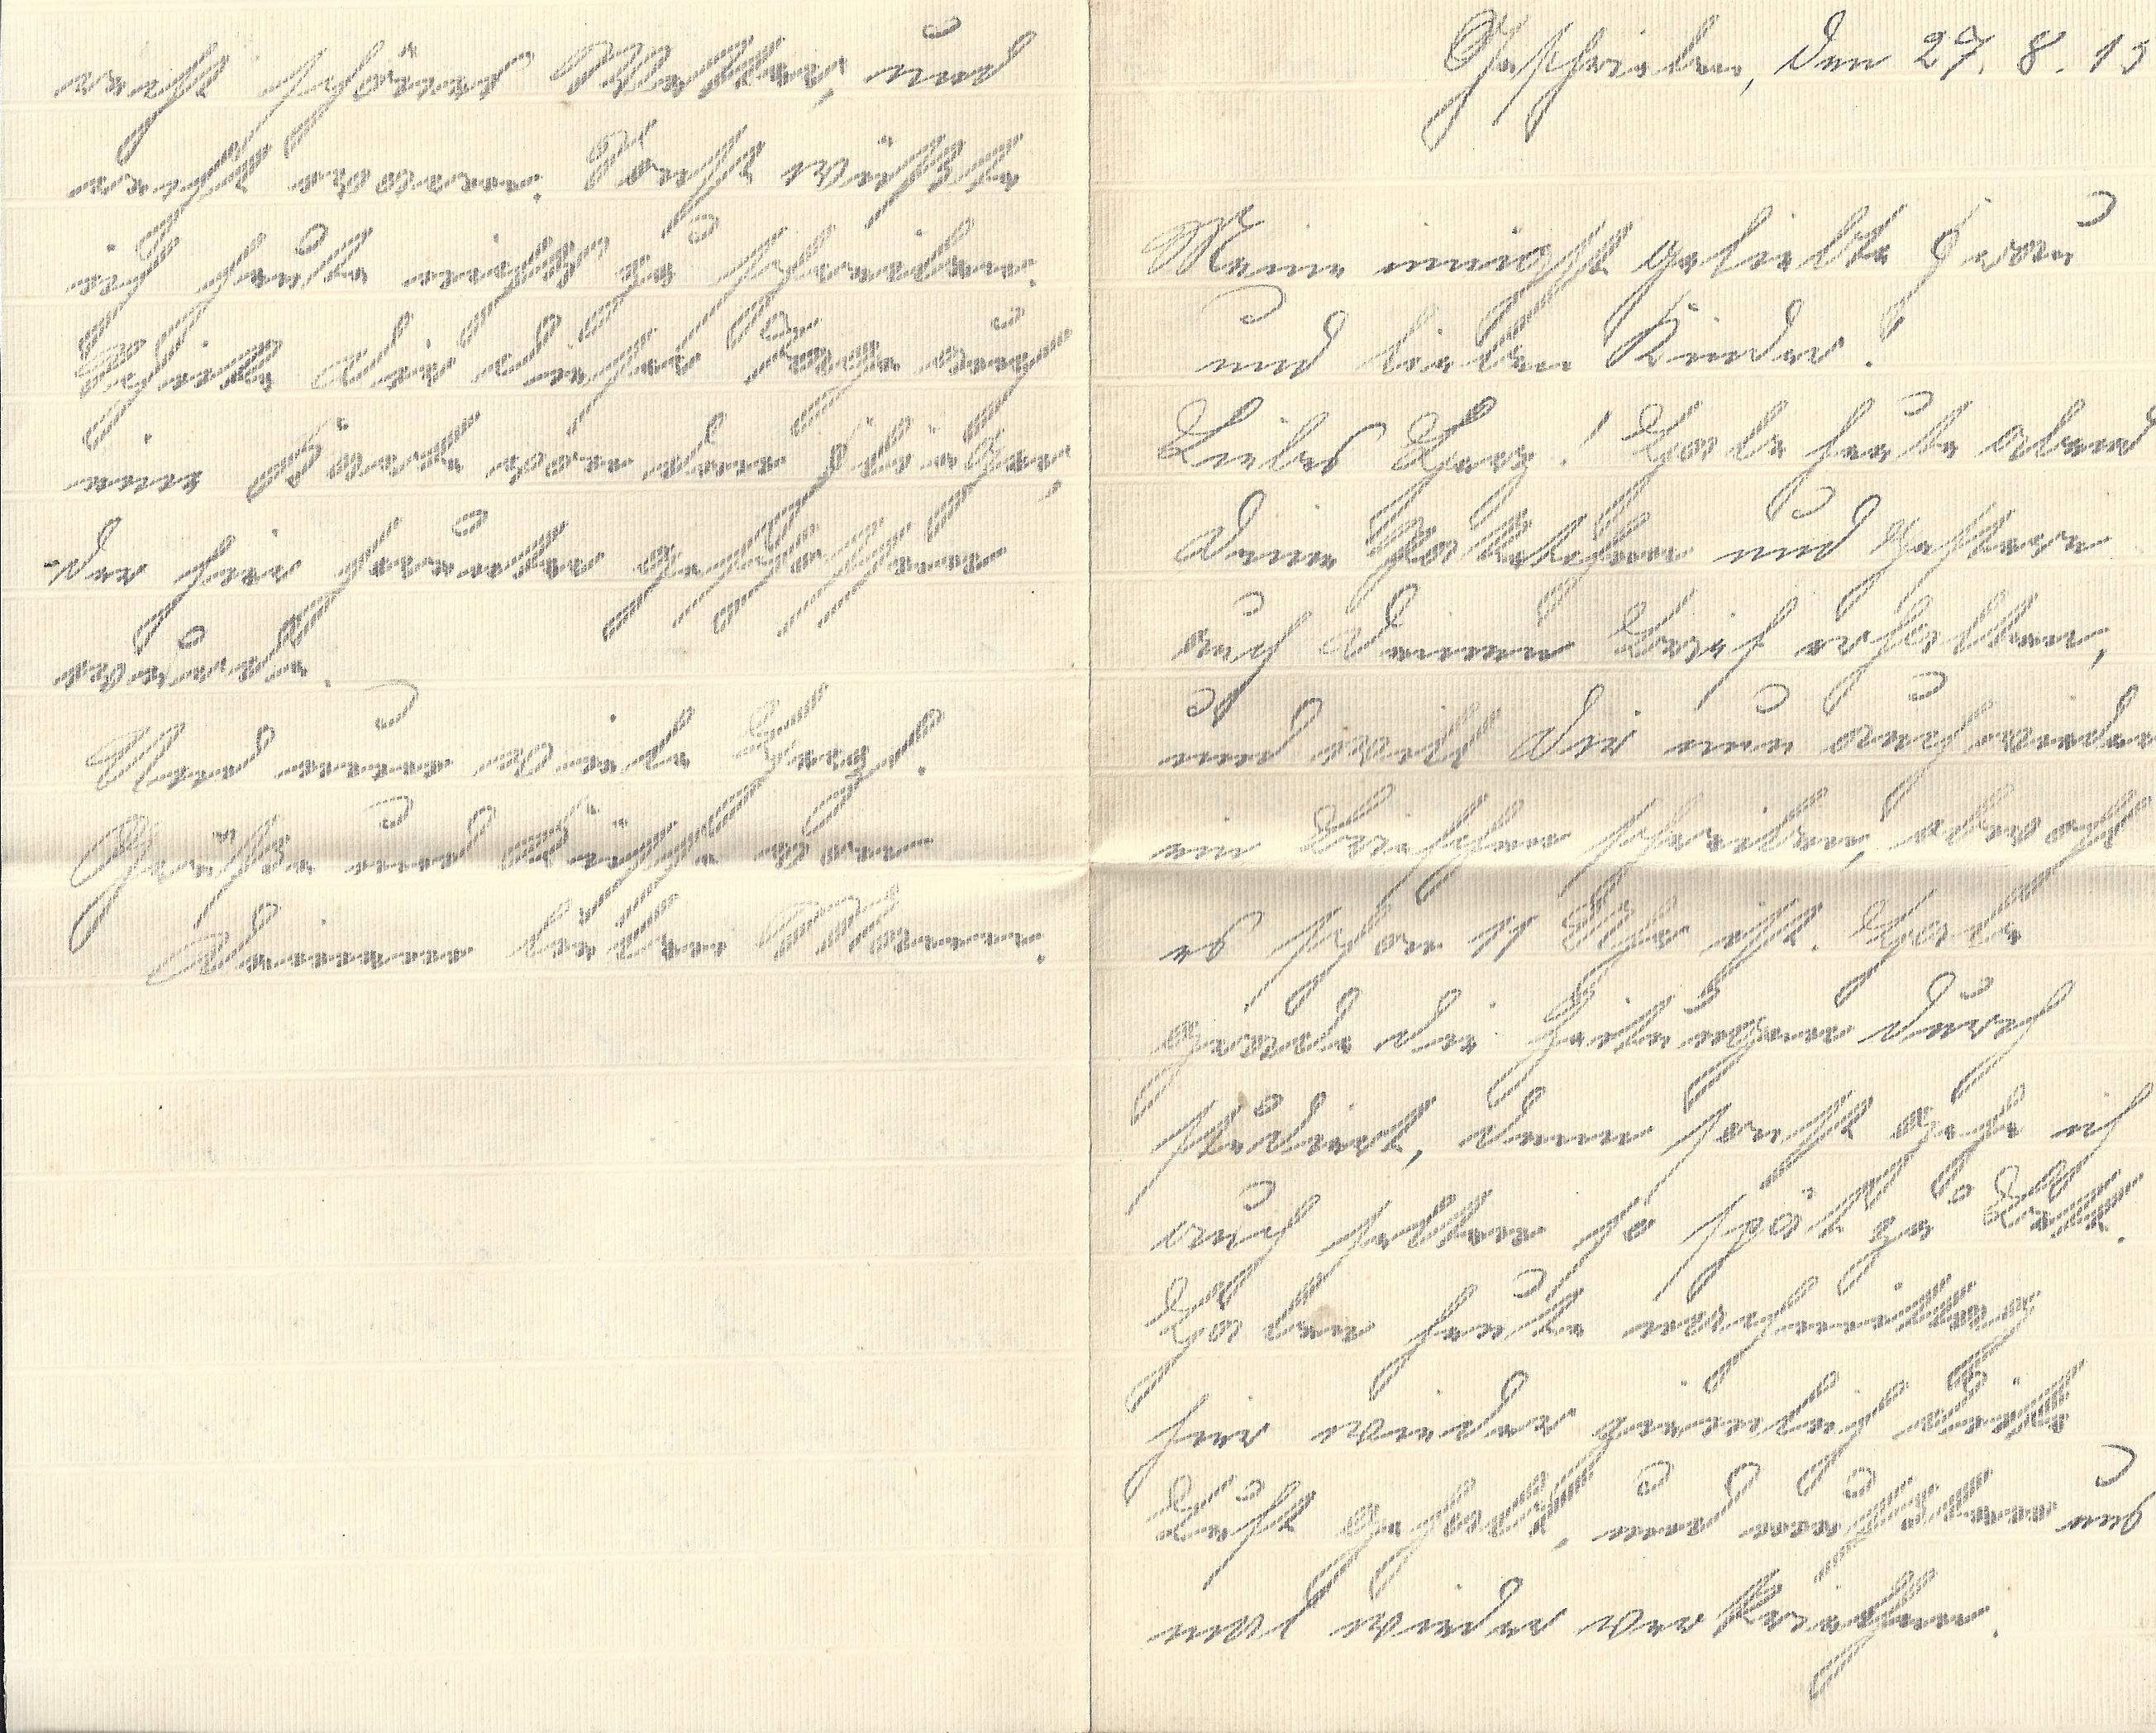 frau kennenlernen brief Oberursel